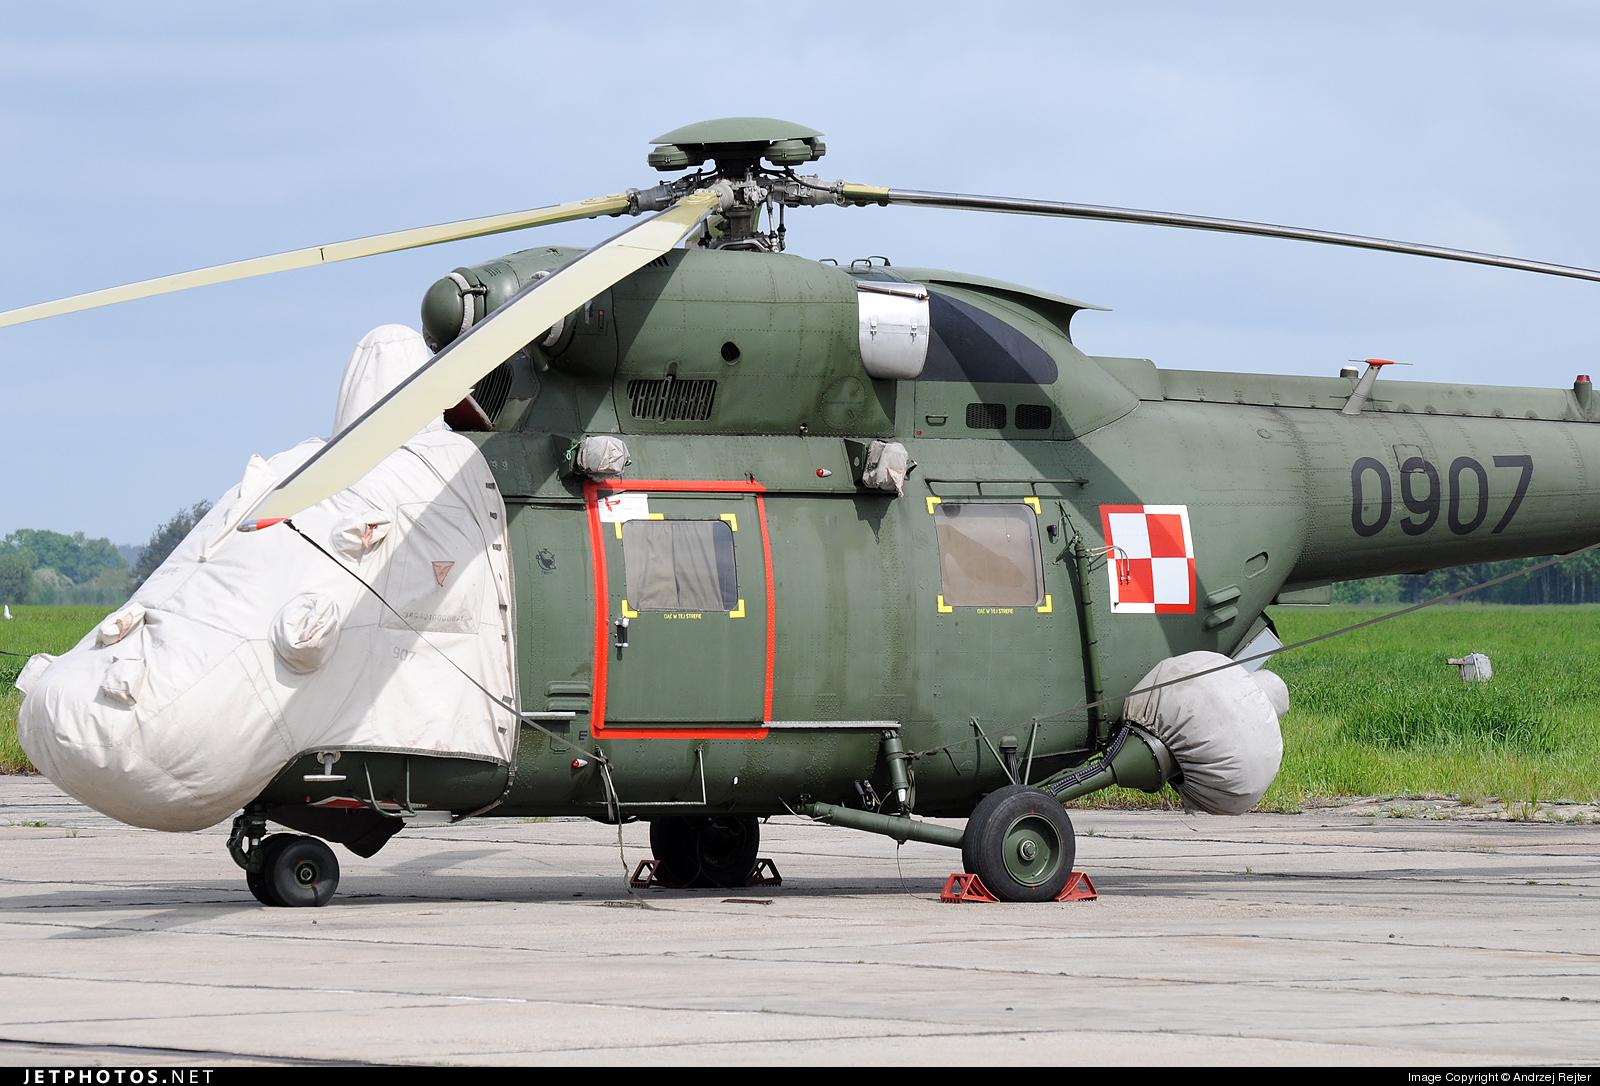 0907 - PZL-Swidnik W3 Sokol - Poland - Army